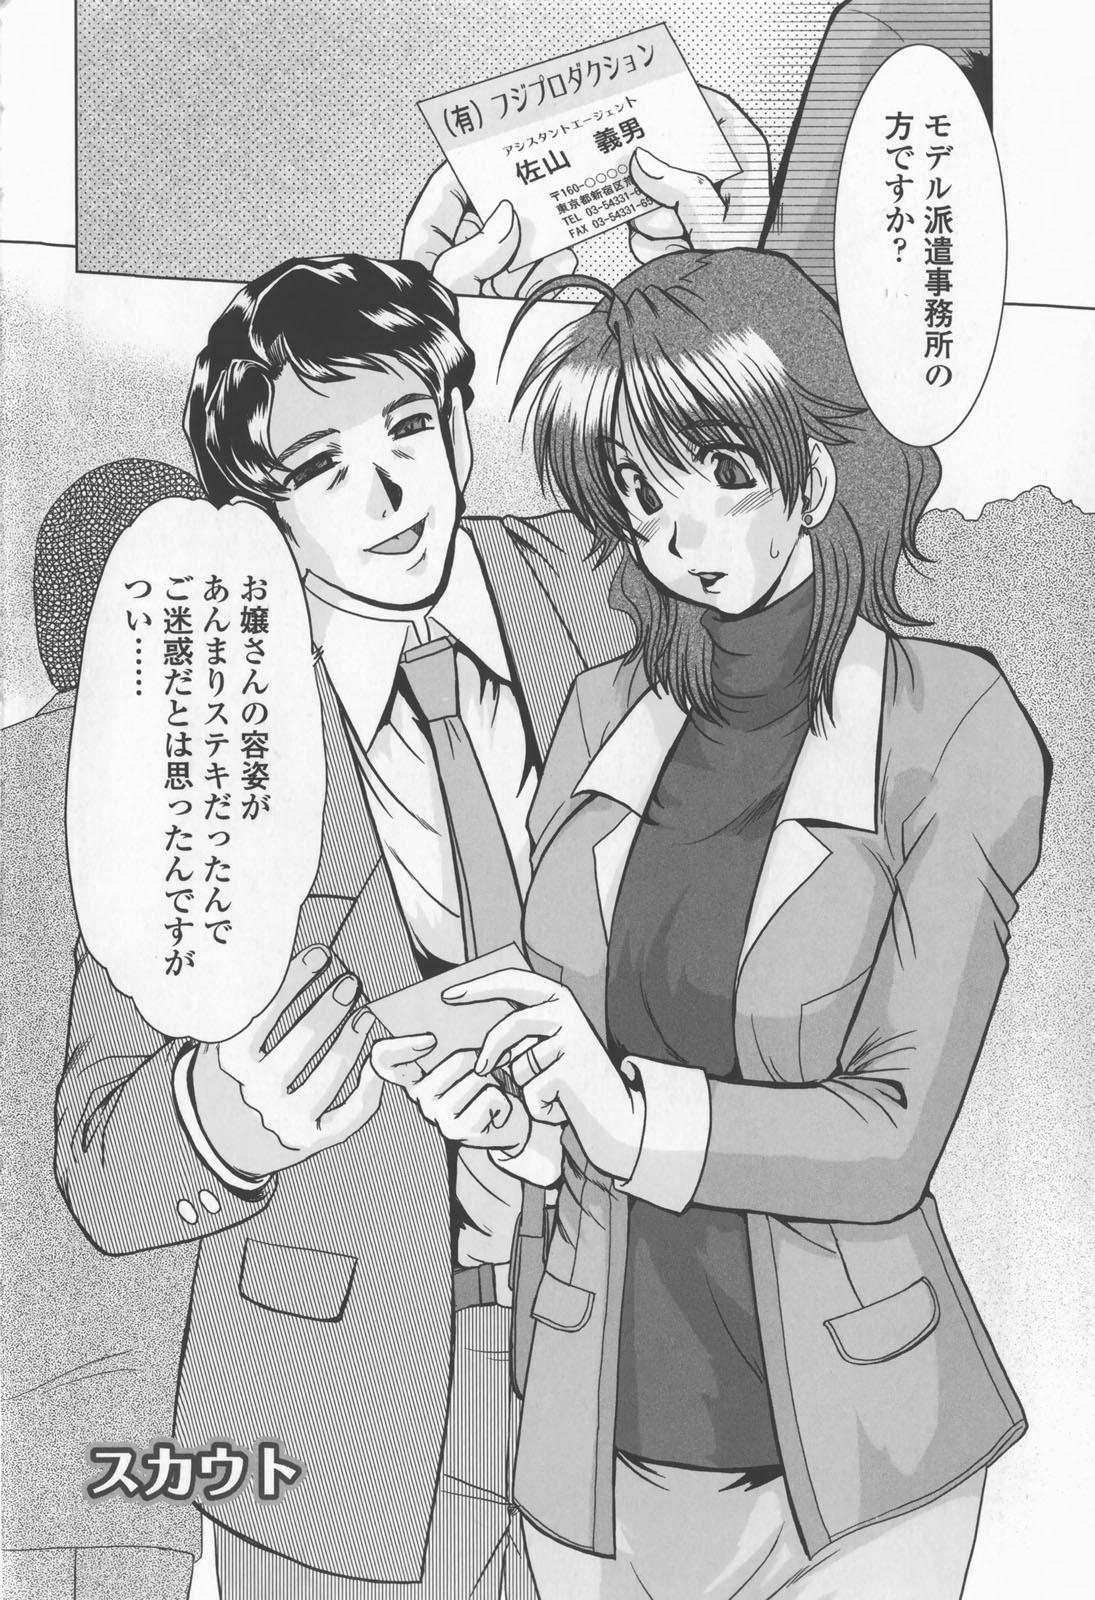 Inran Okusama Gari - Lewd Wife Hunting 9